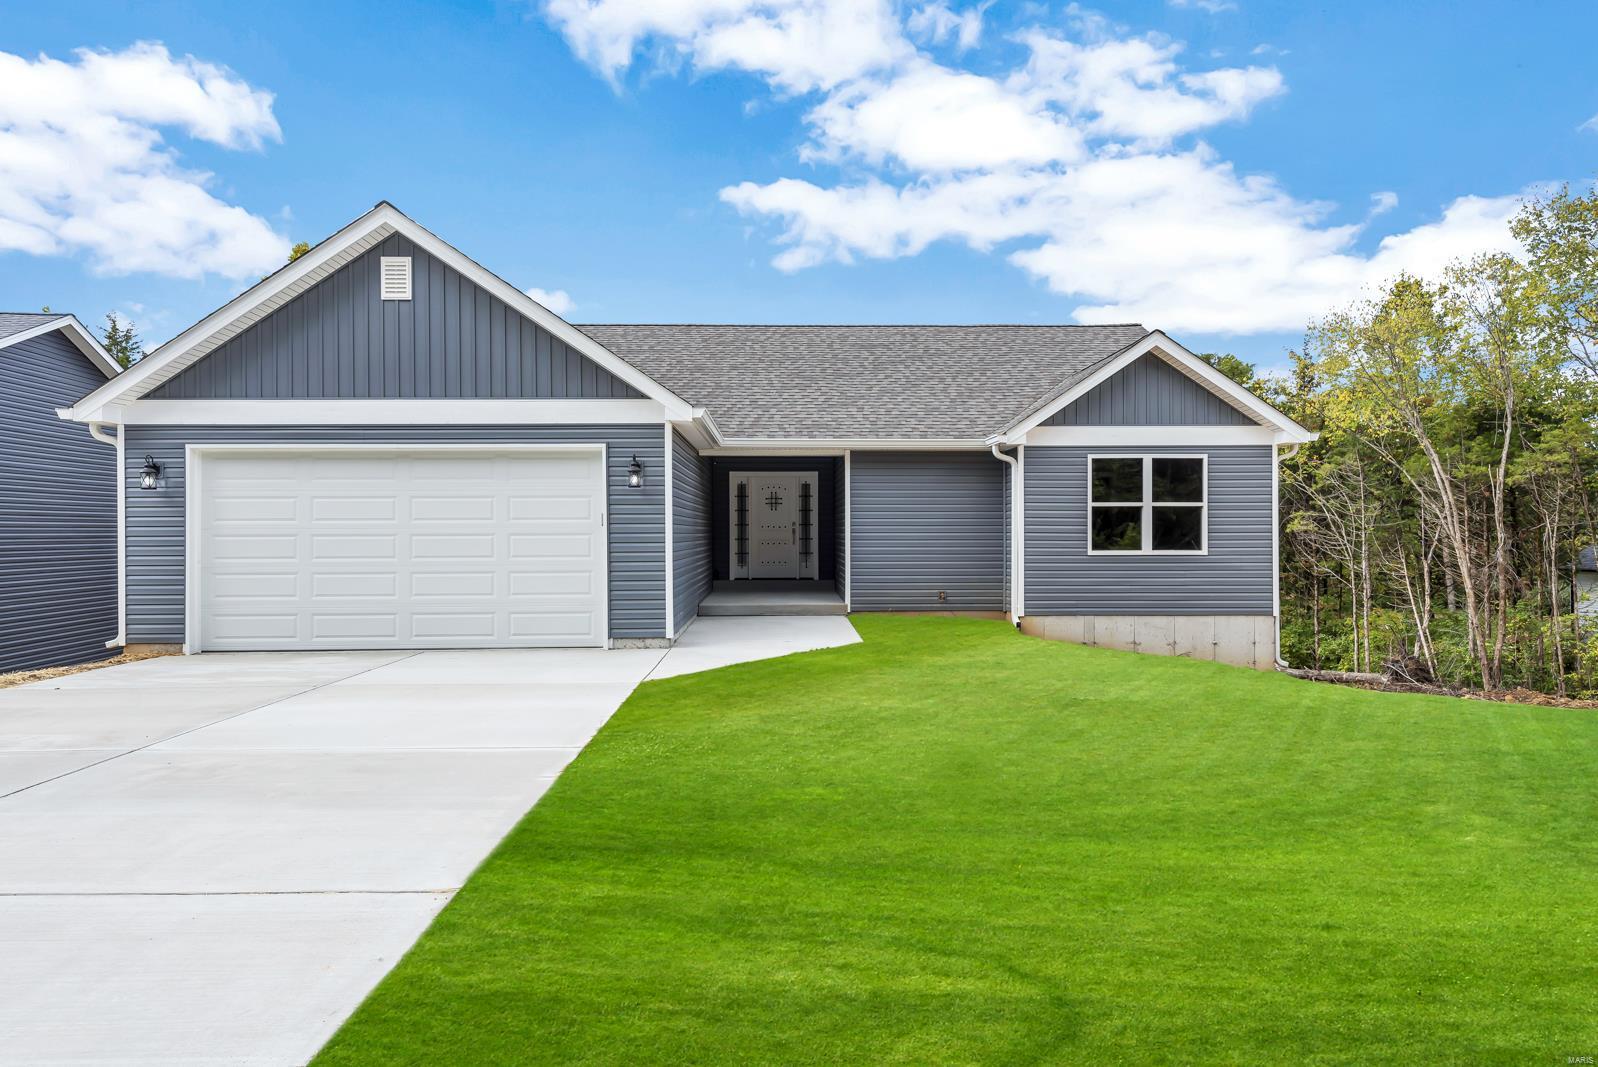 3621 Wayside Property Photo - Catawissa, MO real estate listing